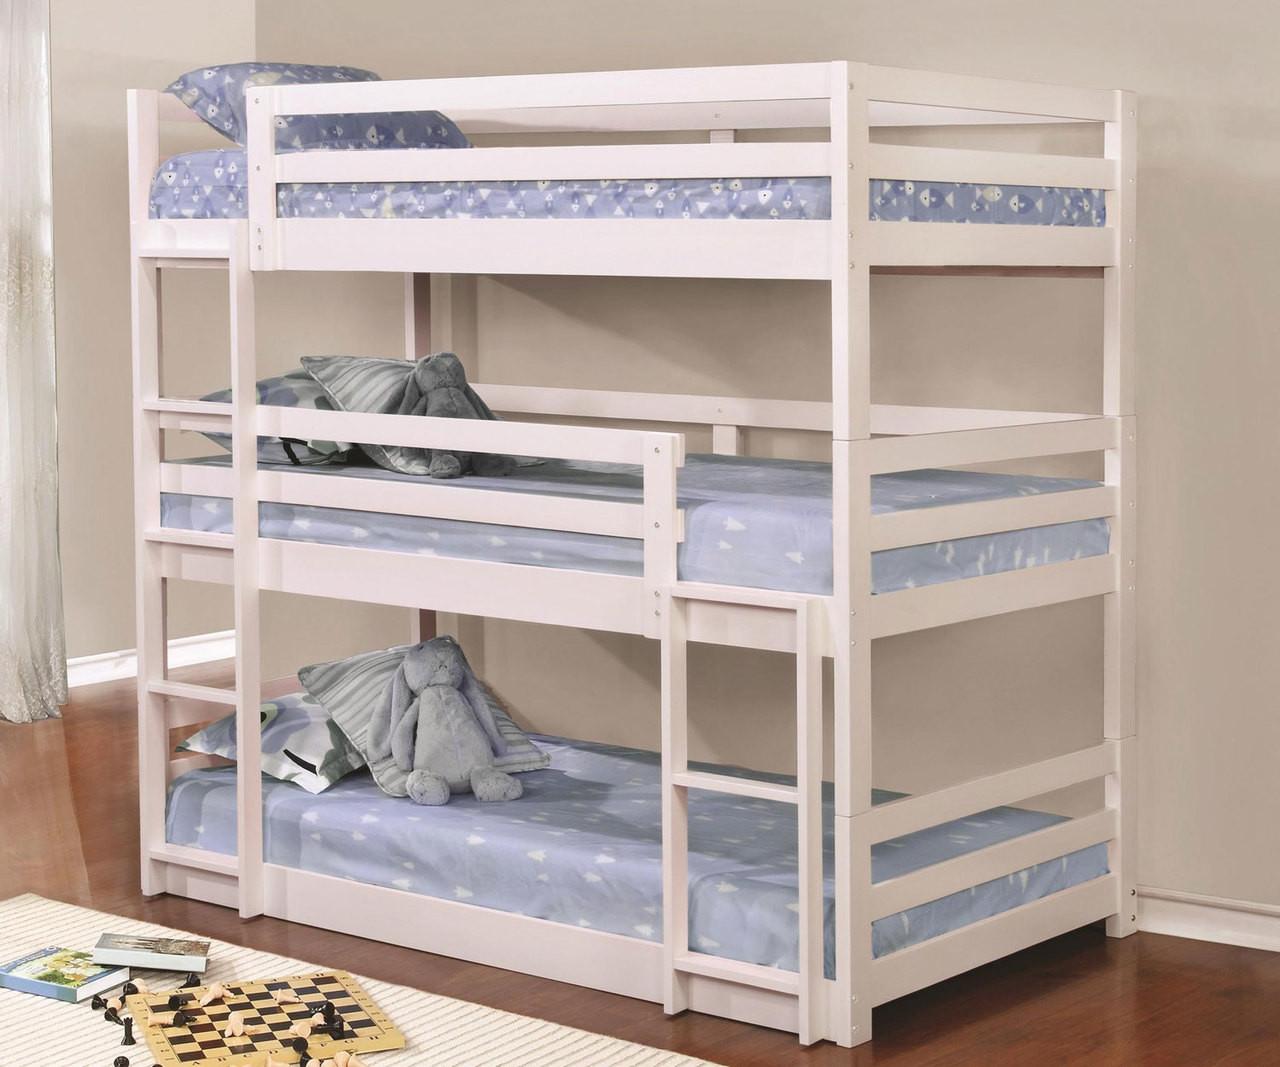 Coaster Sandler Triple Bunk Bed Twin Size White 401302 Coaster